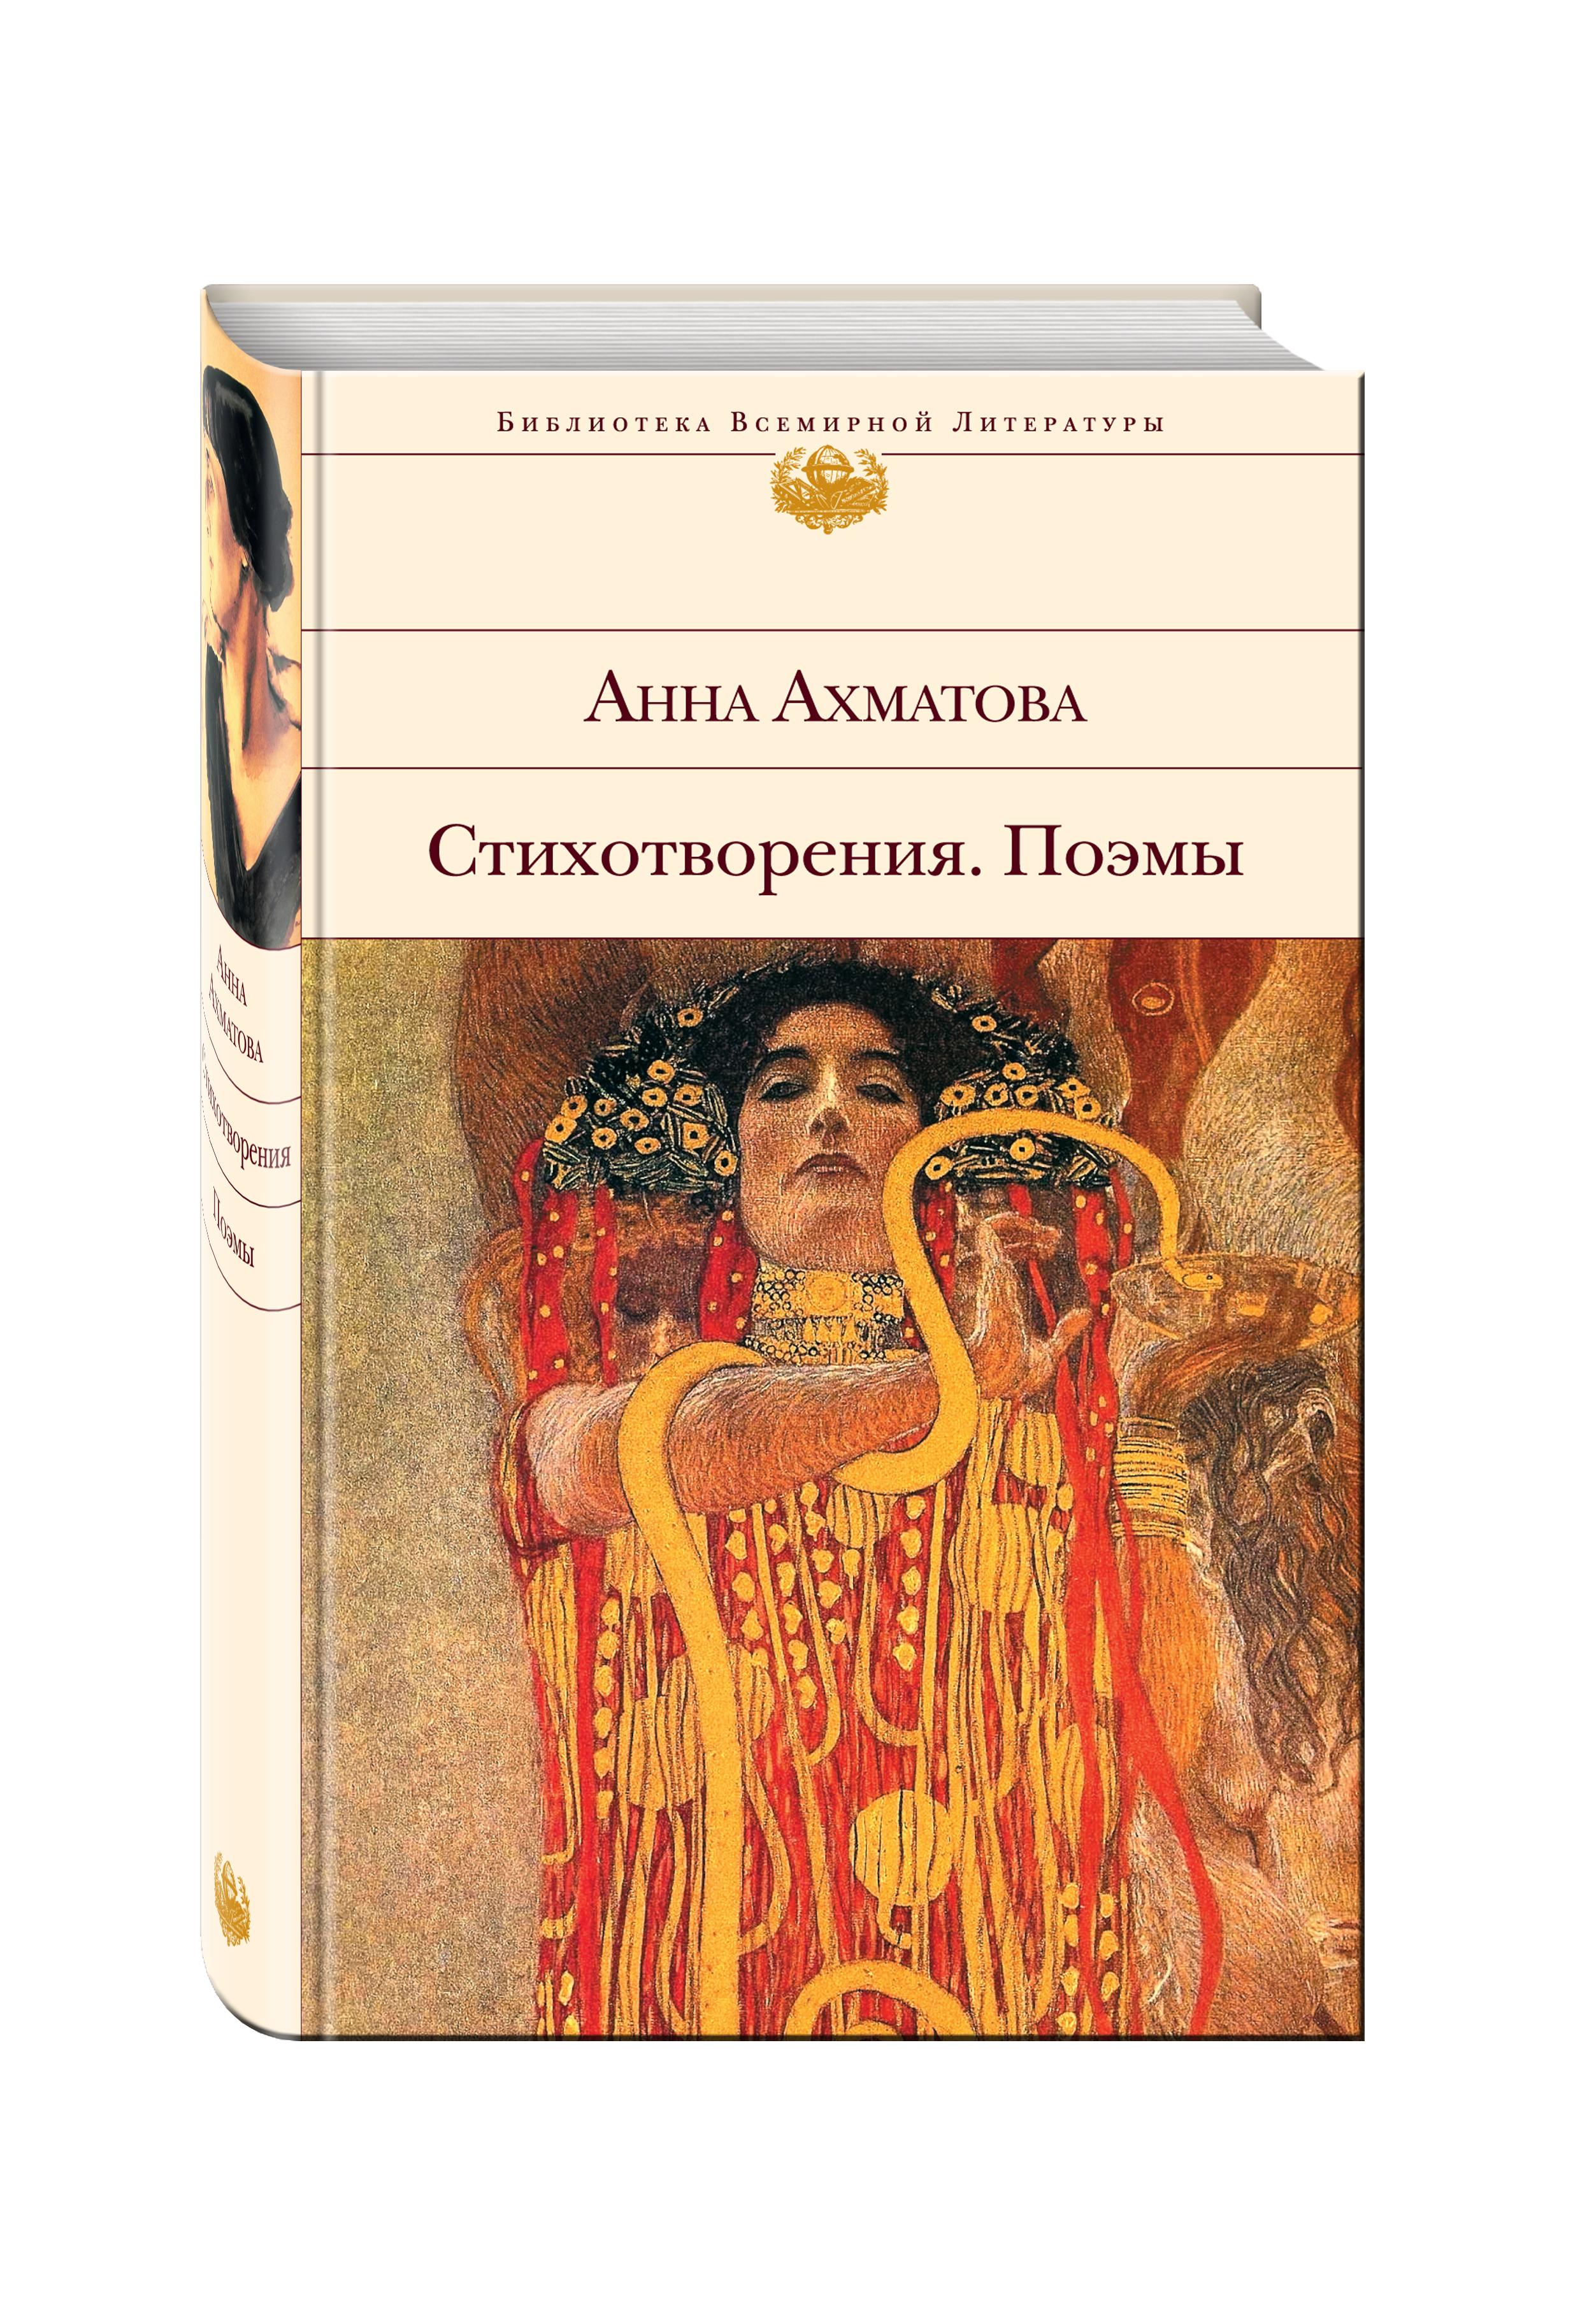 Ахматова А.А. Стихотворения. Поэмы марина цветаева стихотворения поэмы 1998год